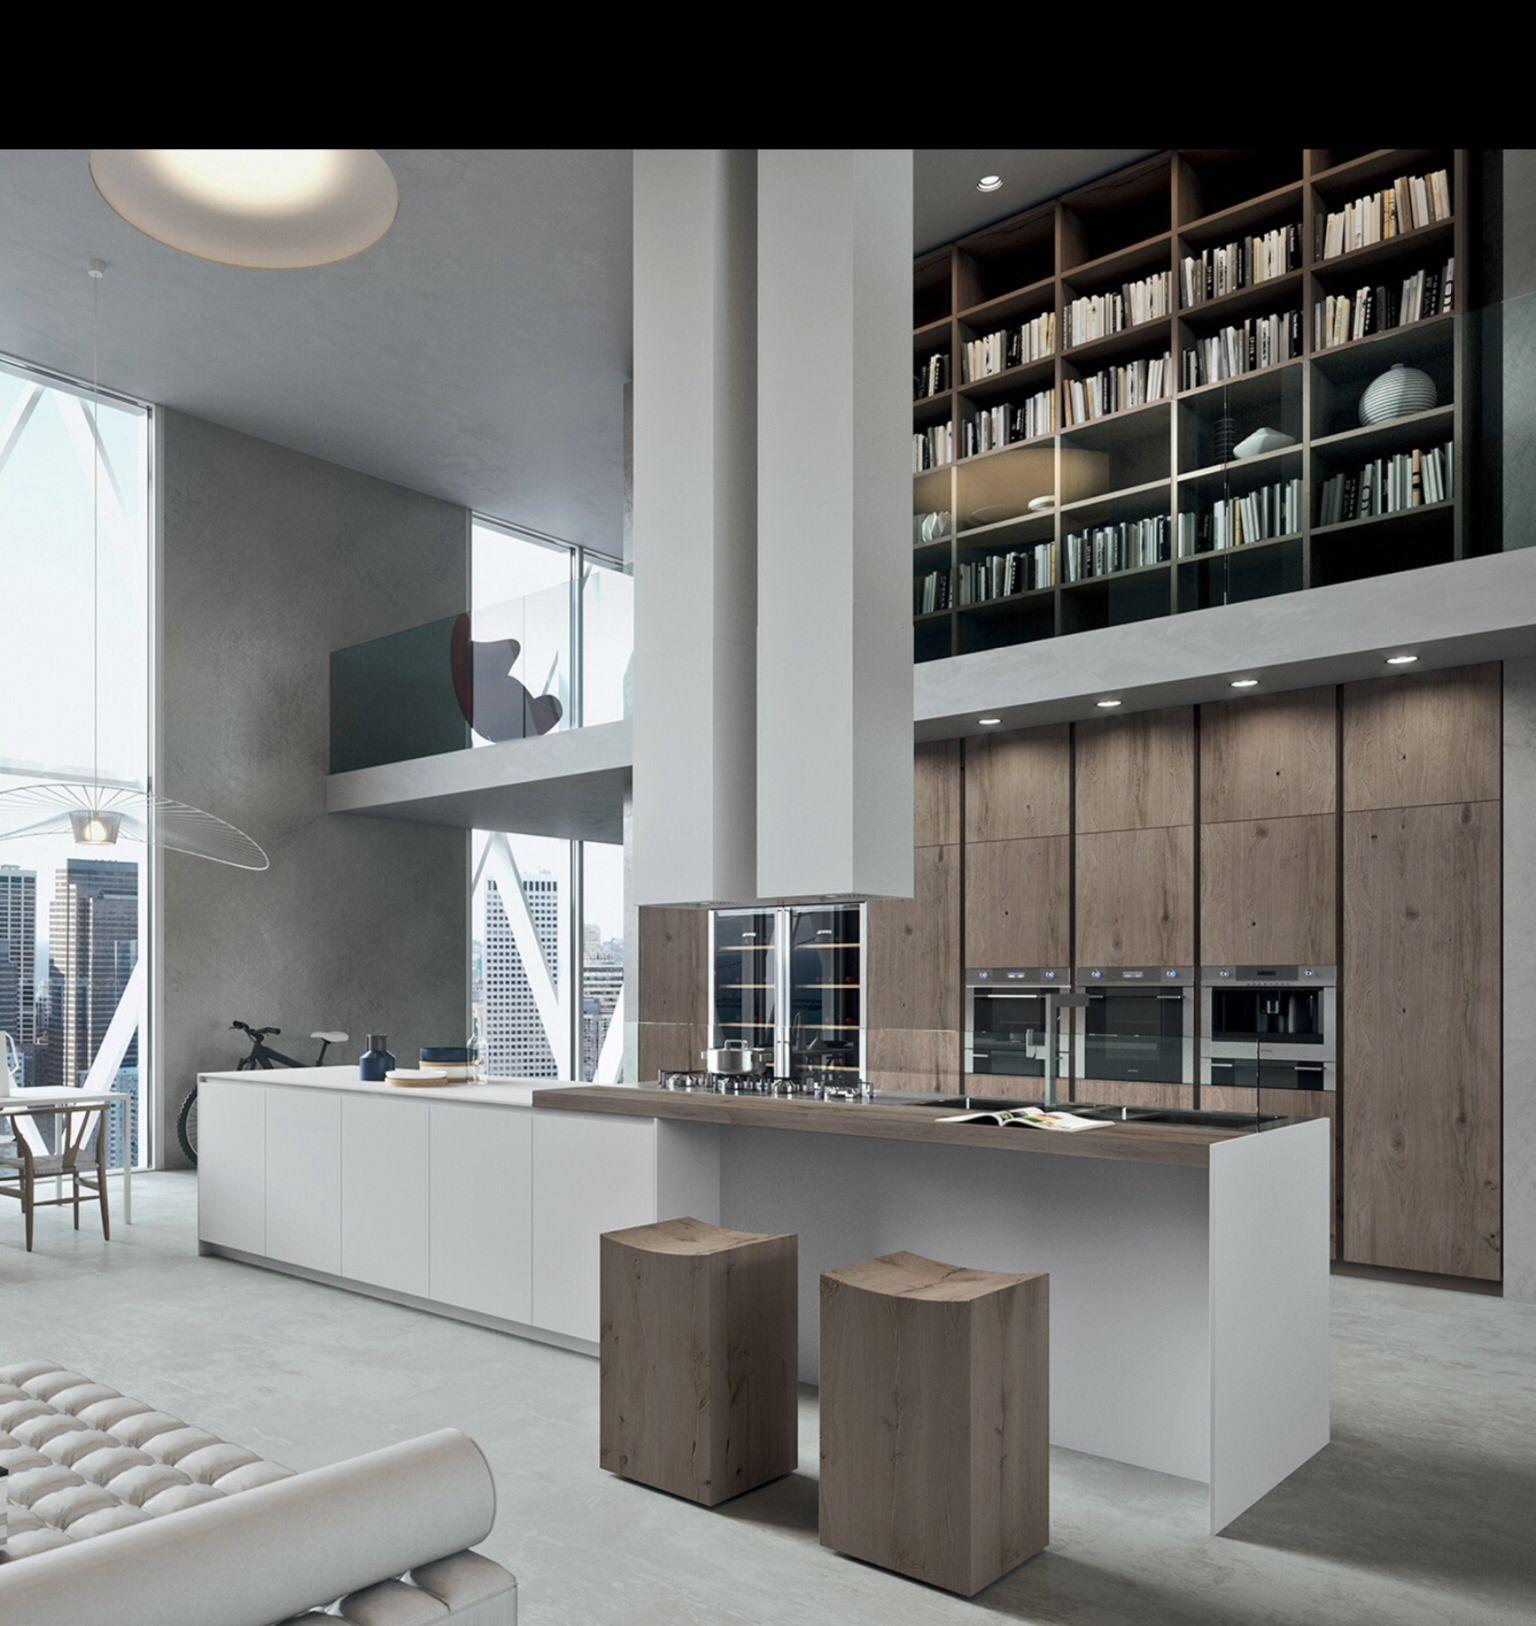 Arrital arrital cucine cocinas italianas interior de for Decorazioni cucine moderne